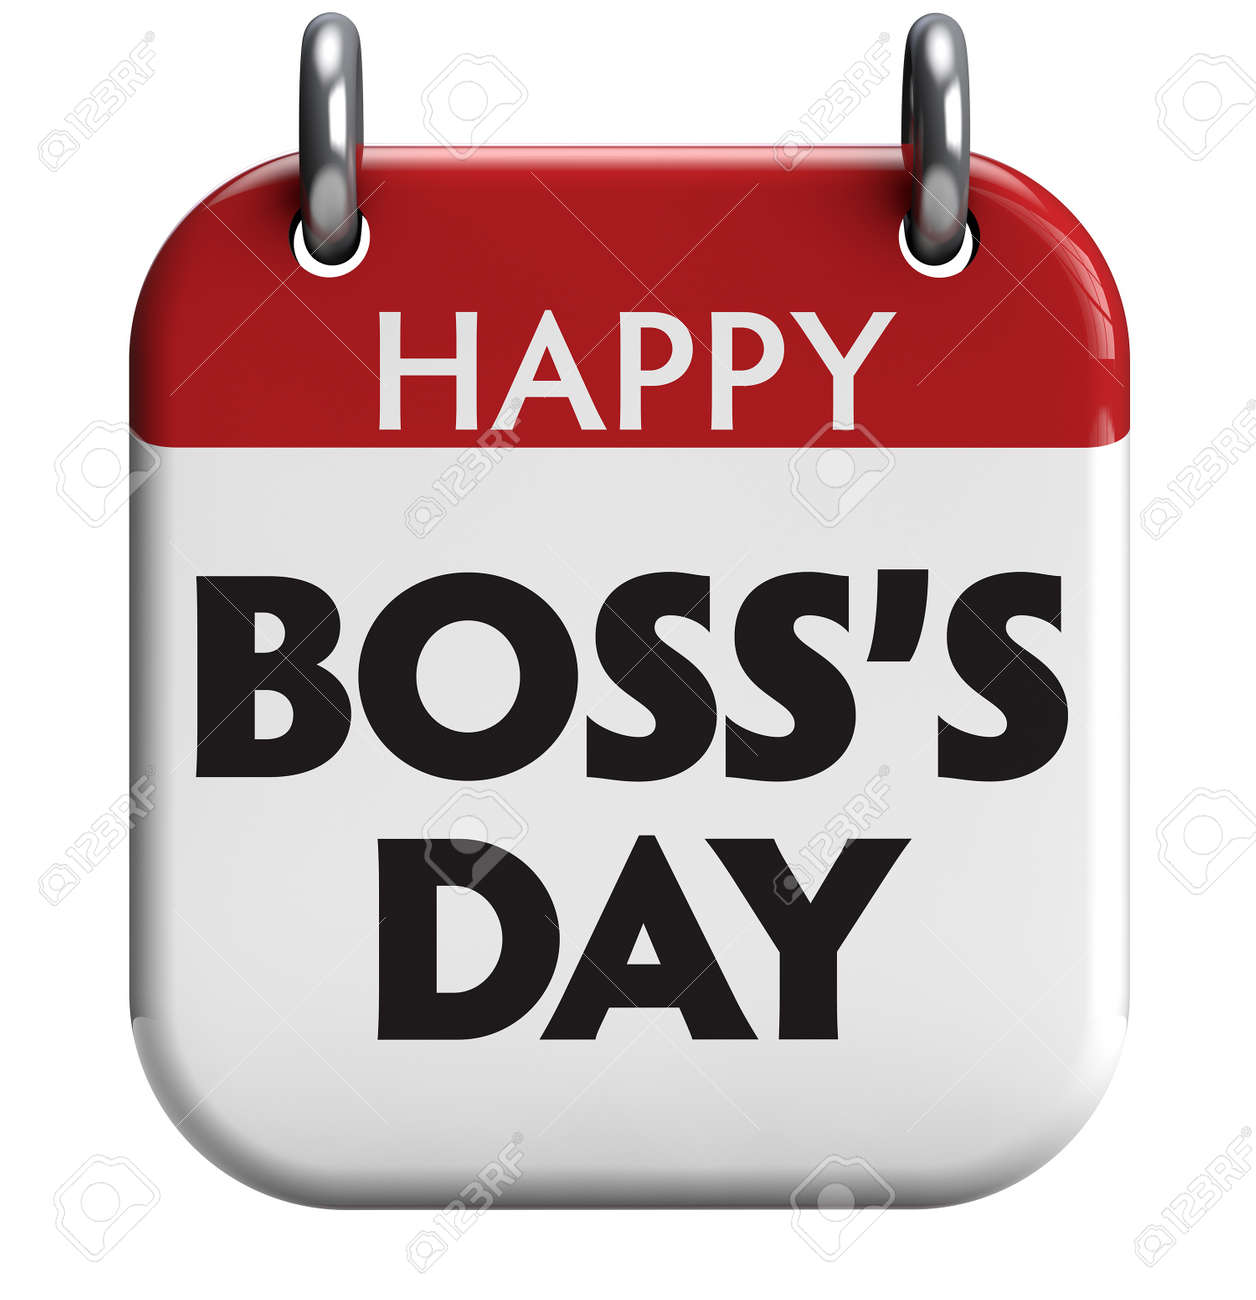 Happy Boss's Day - 21955210